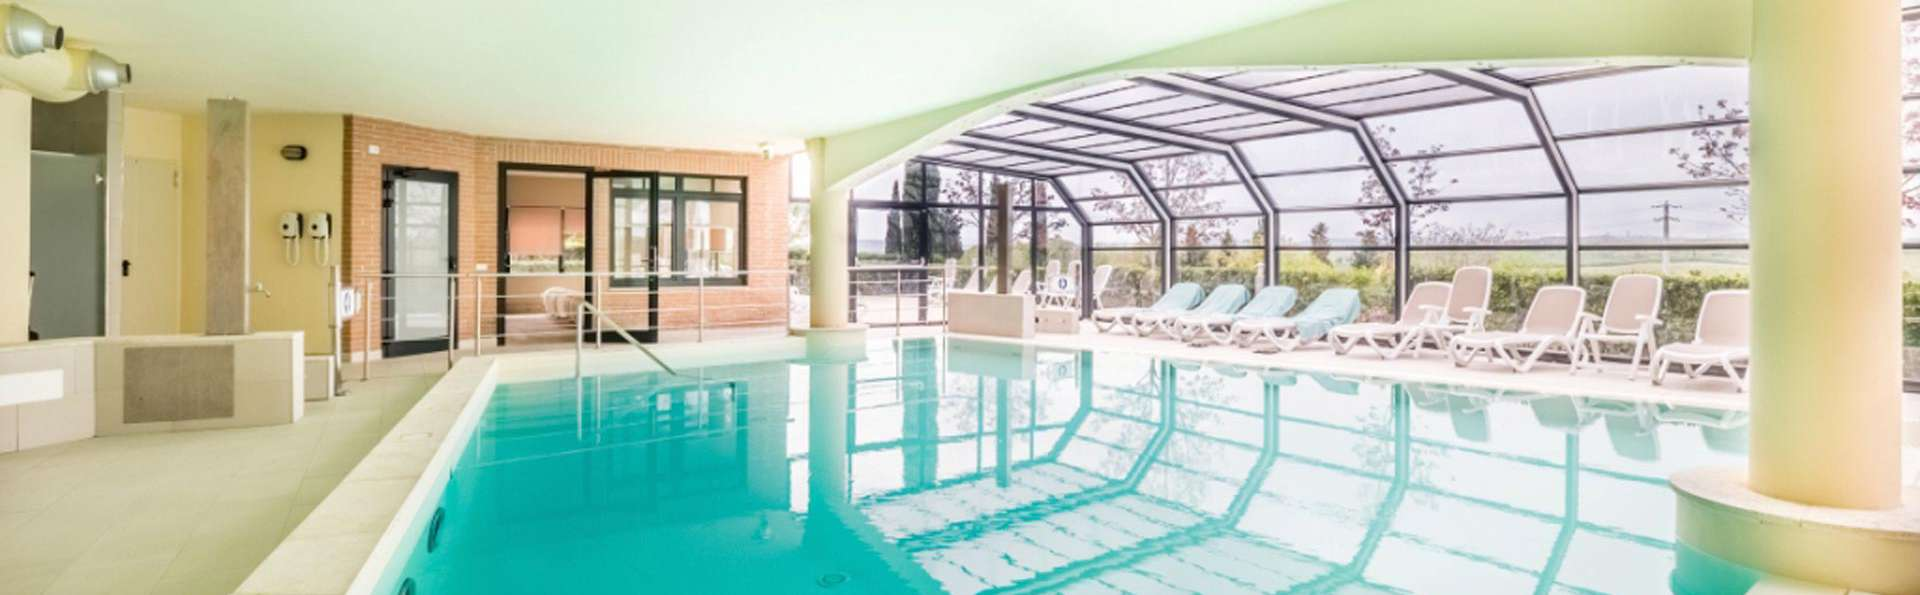 Hotel Montaperti - edit_pool3.jpg